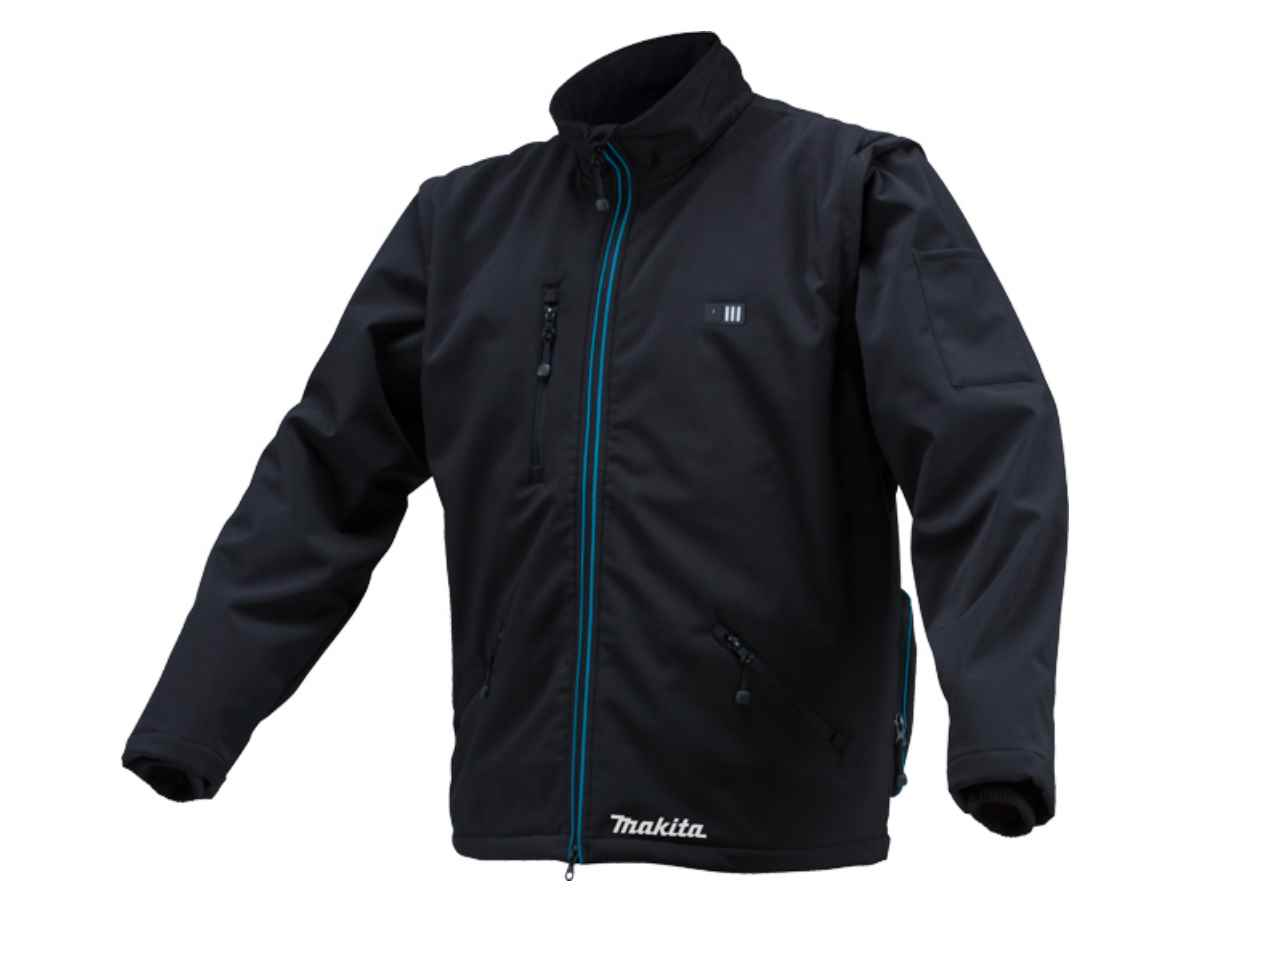 makita heated jacket washing instructions